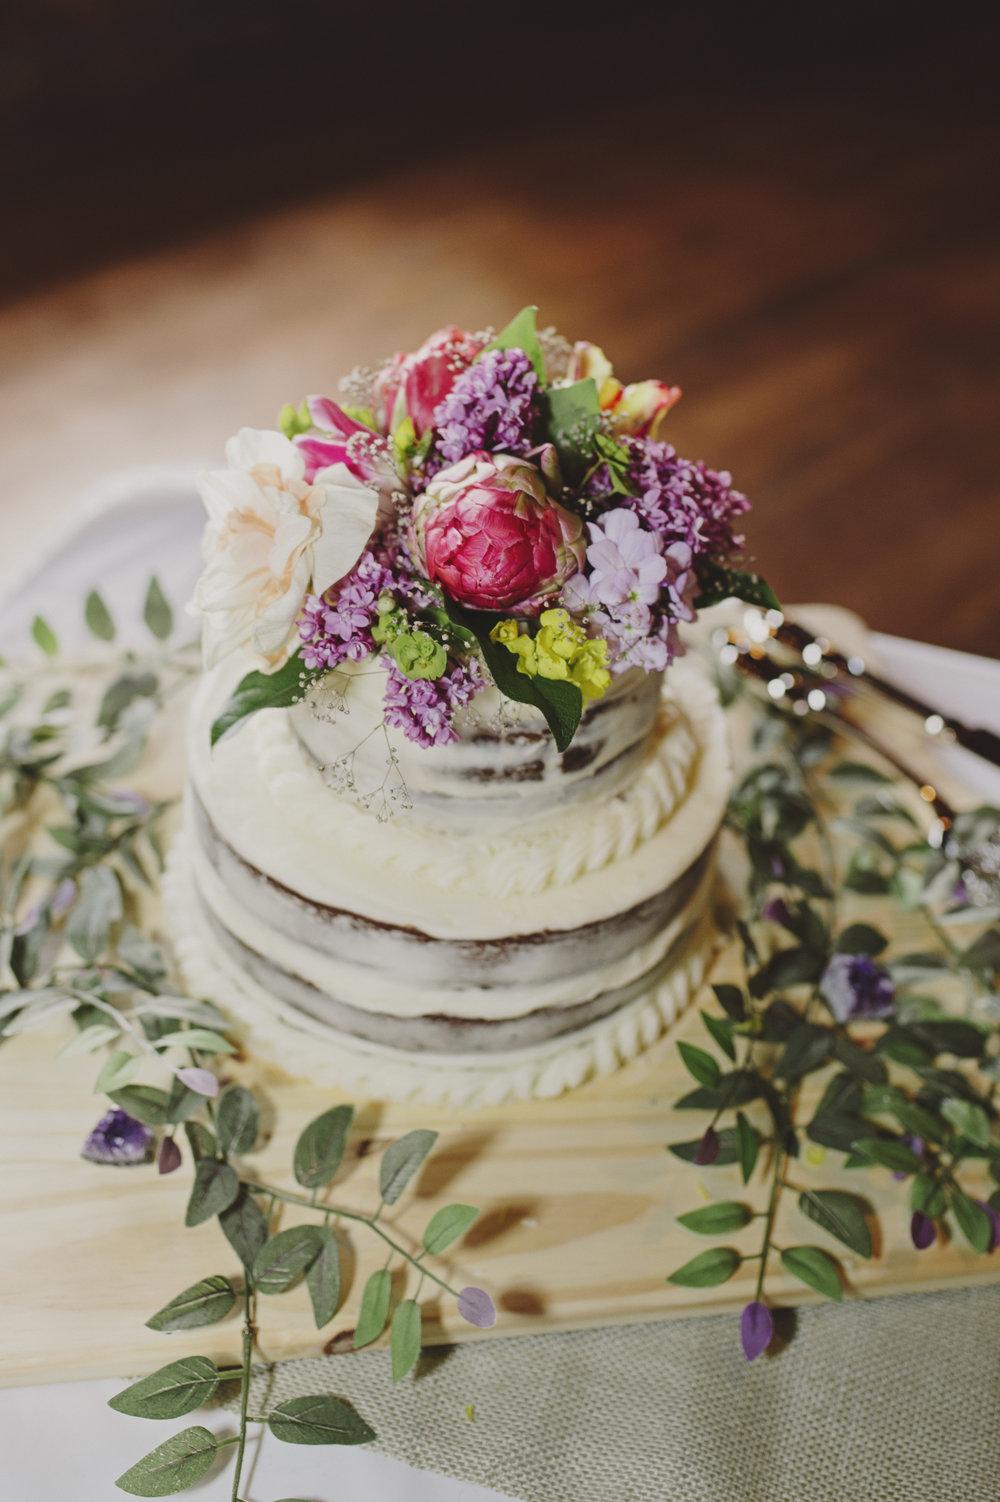 Woodsy Wedding_Kitsap Memorial State Park Wedding_Kelsey Lane Photography_flowers on wedding cake